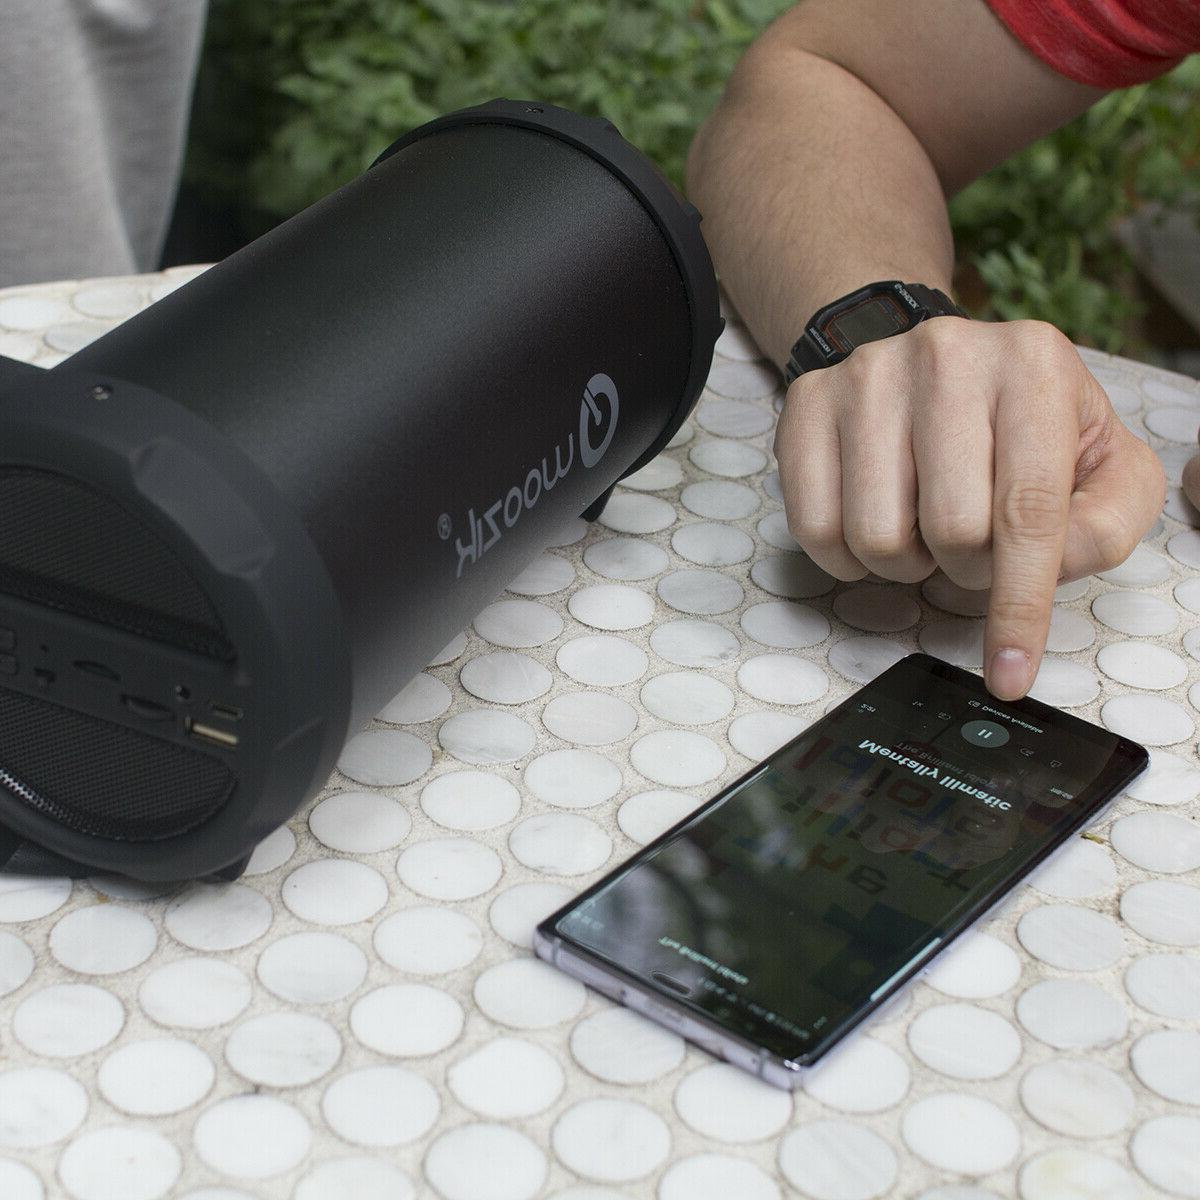 LOUD BLUETOOTH SPEAKER Wireless Rechargeable Stereo